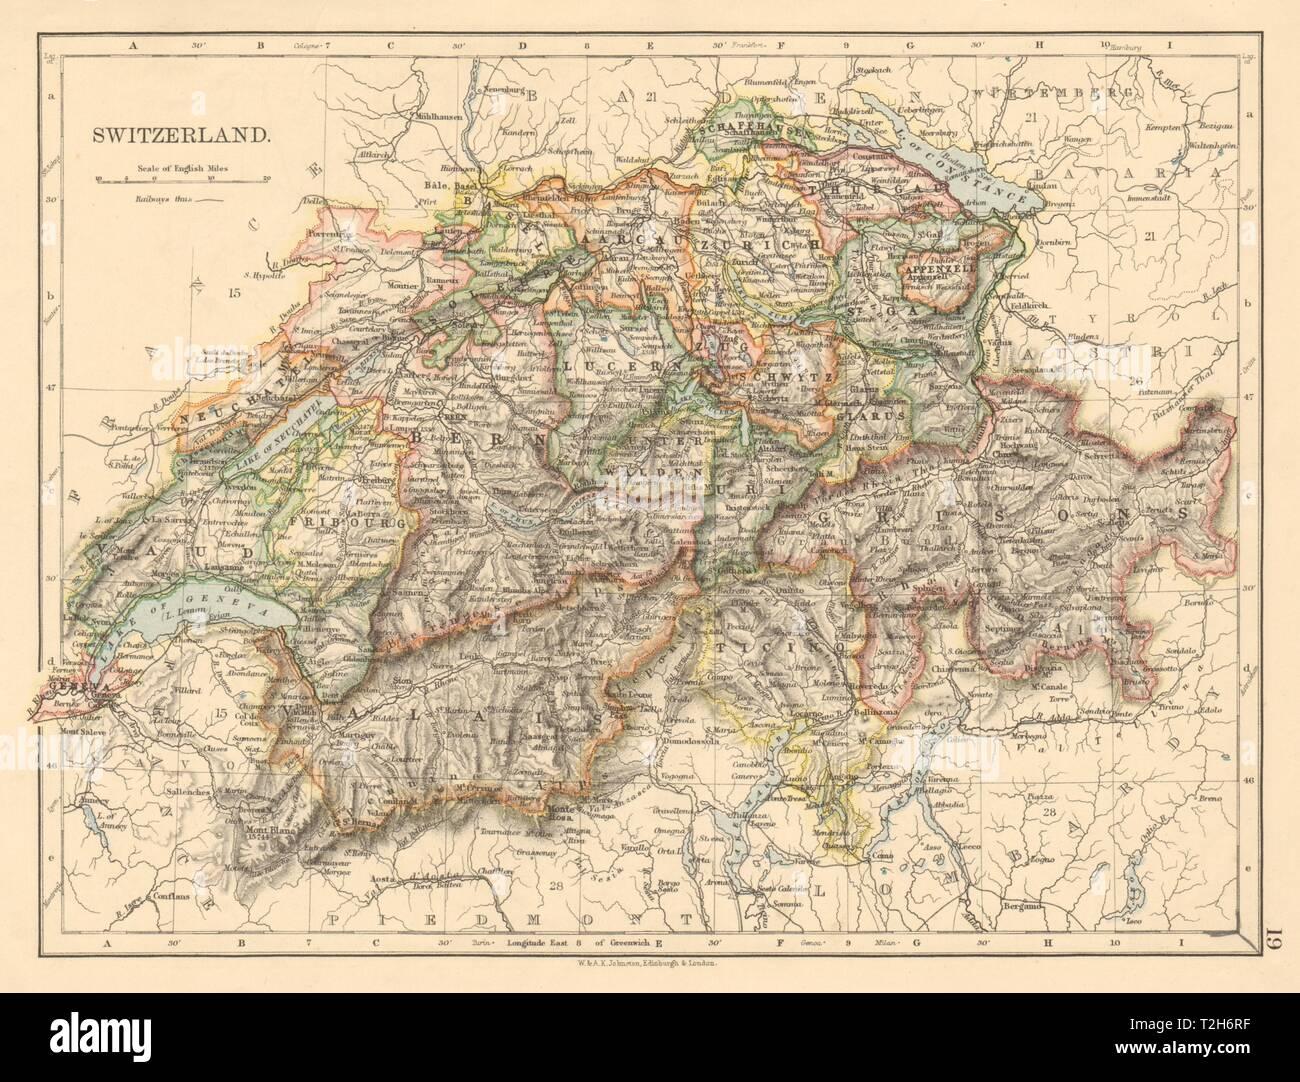 SWITZERLAND Shows cantons & railways Alps Italian lakes JOHNSTON ...